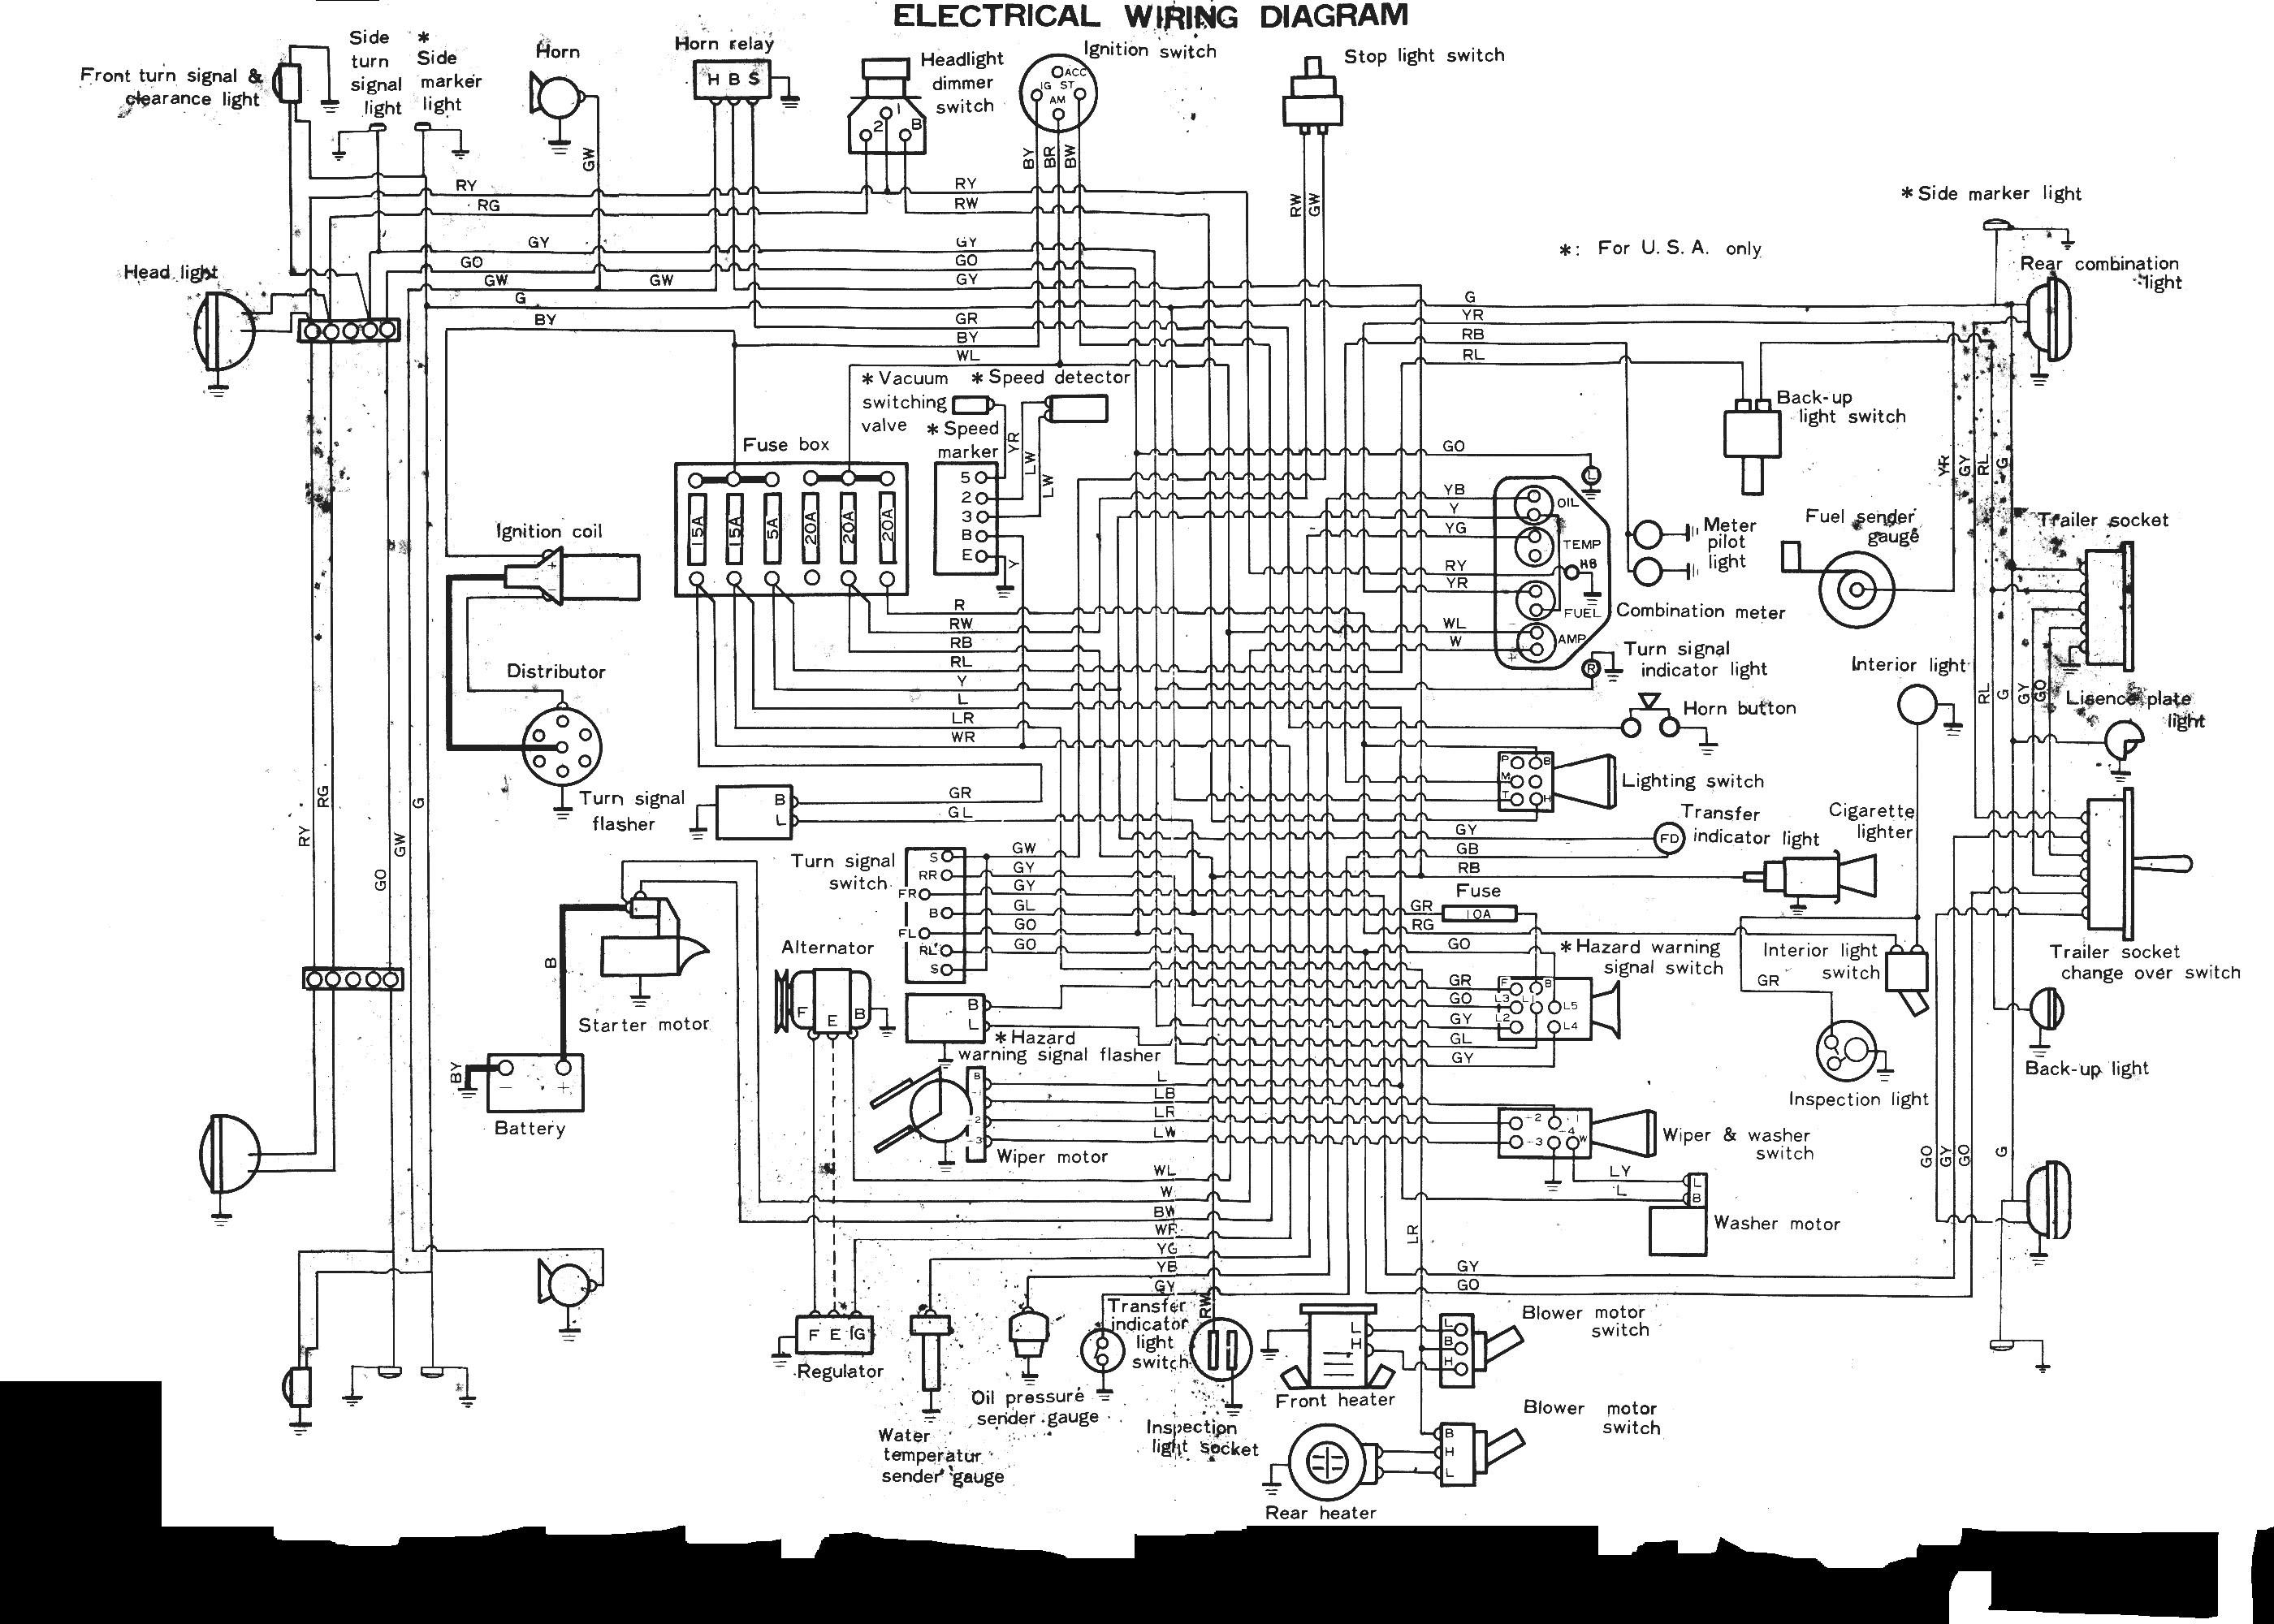 2001 Pt Cruiser Wiring Diagram Wiring Diagram Var Straight Unique A Straight Unique A Viblock It